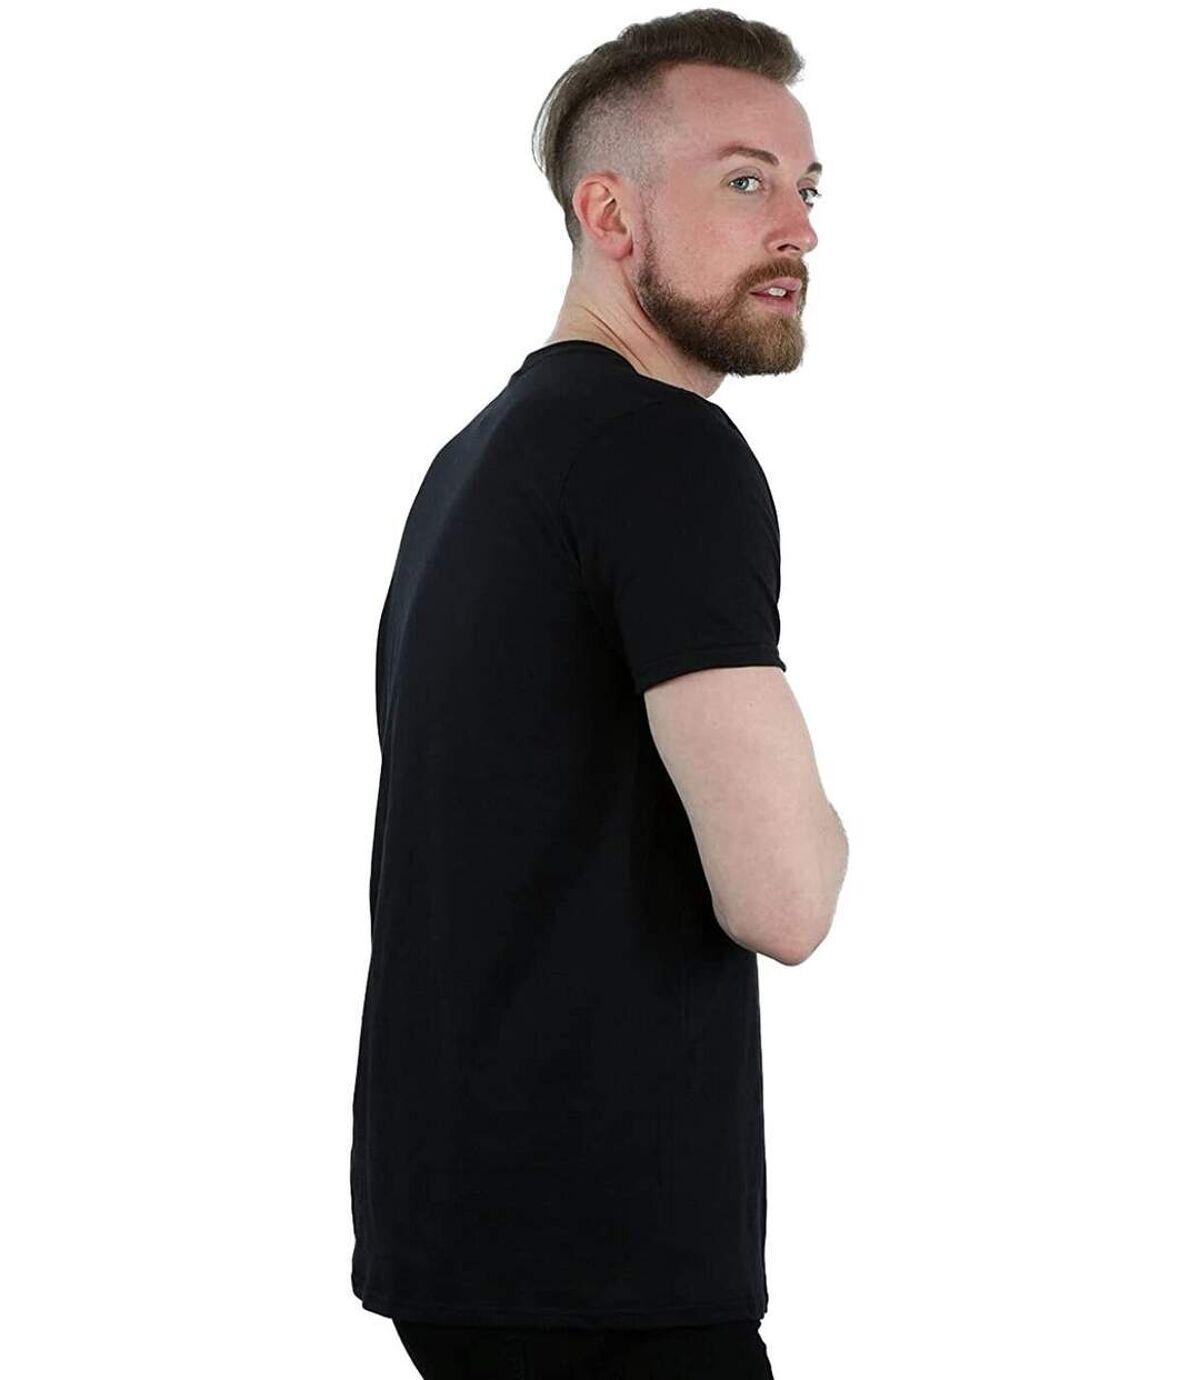 The Flash Mens TV Star Laboratories T-Shirt (Black) - UTNS5487